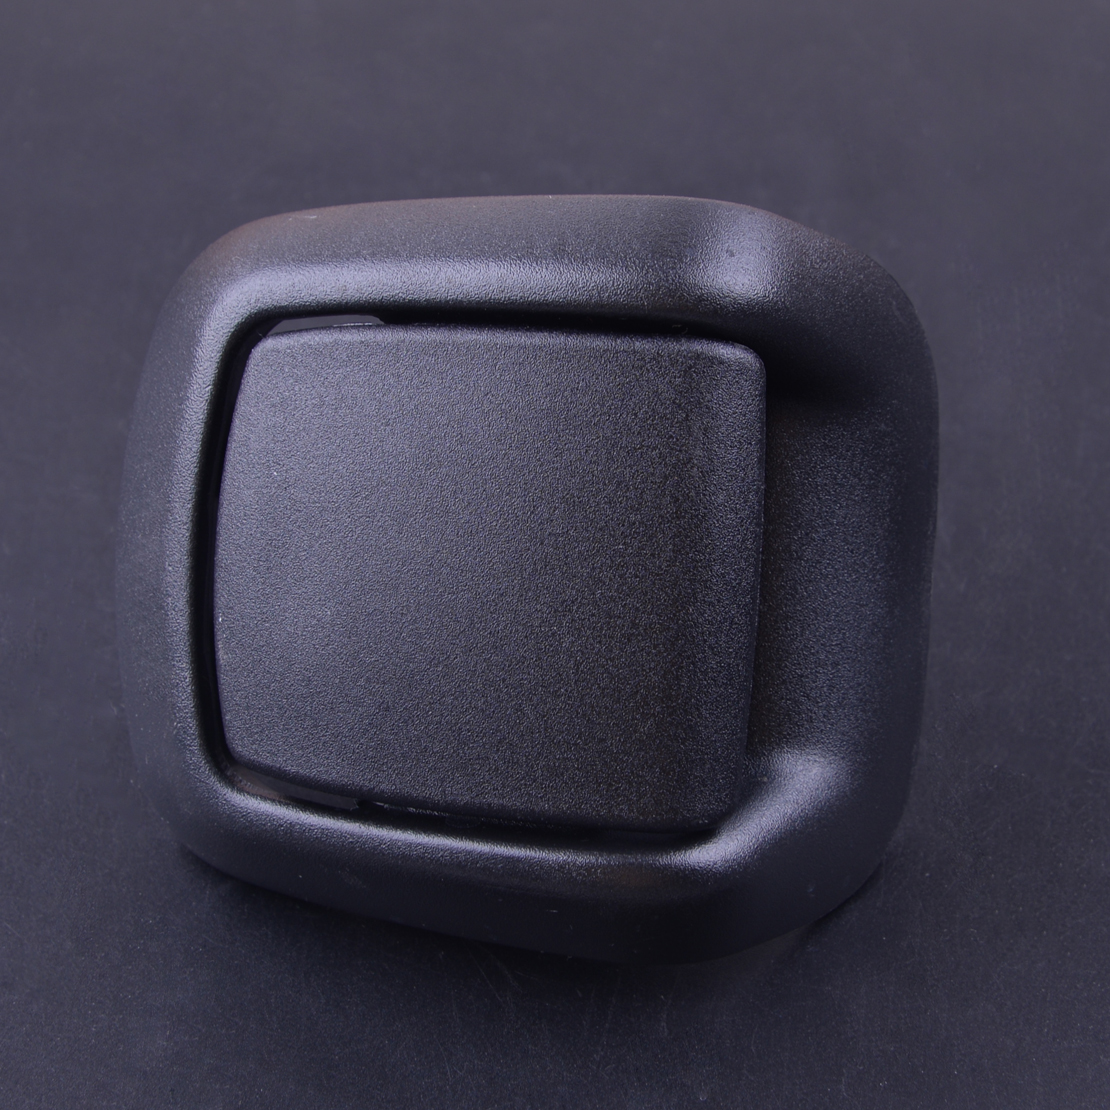 Beler Black Plastic Car Inner Front Left Seat Tilt Handle Fit For Ford Fiesta MK6 VI 3 Door 2002-2005 2006 2007 2008 1417521